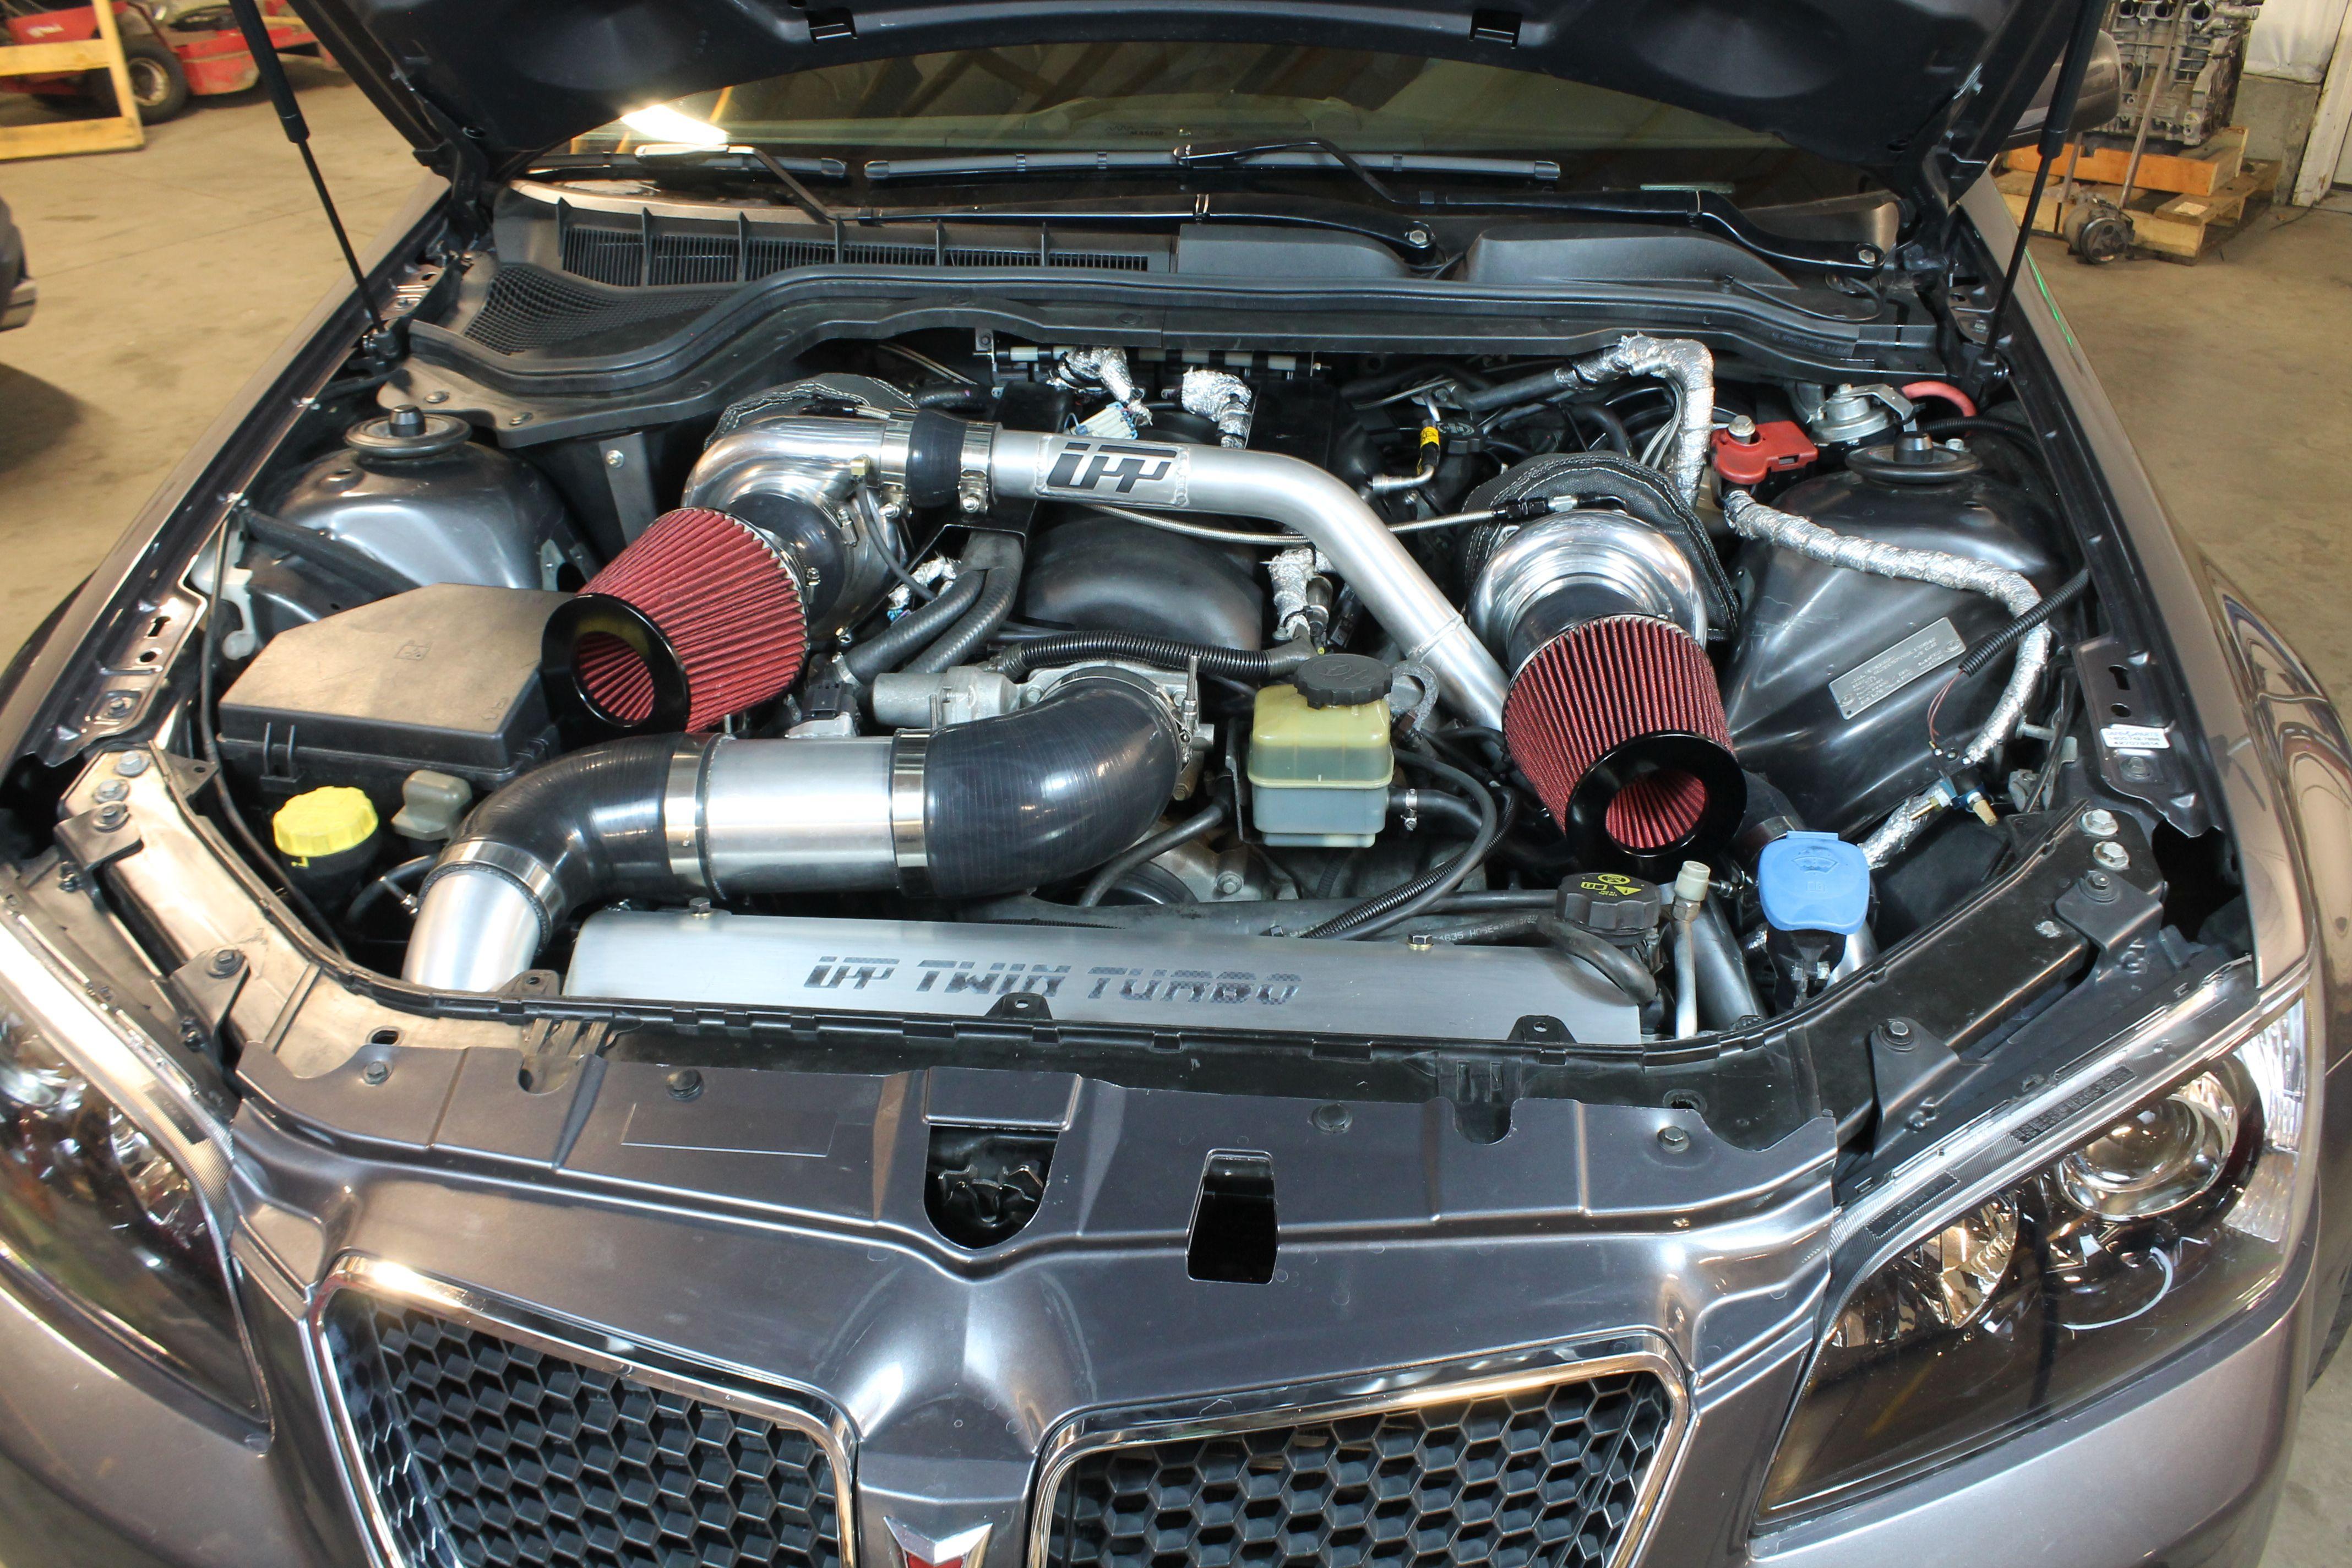 Upp Turbo Twin Turbo System Pontiac G8 Gt Project Turbo